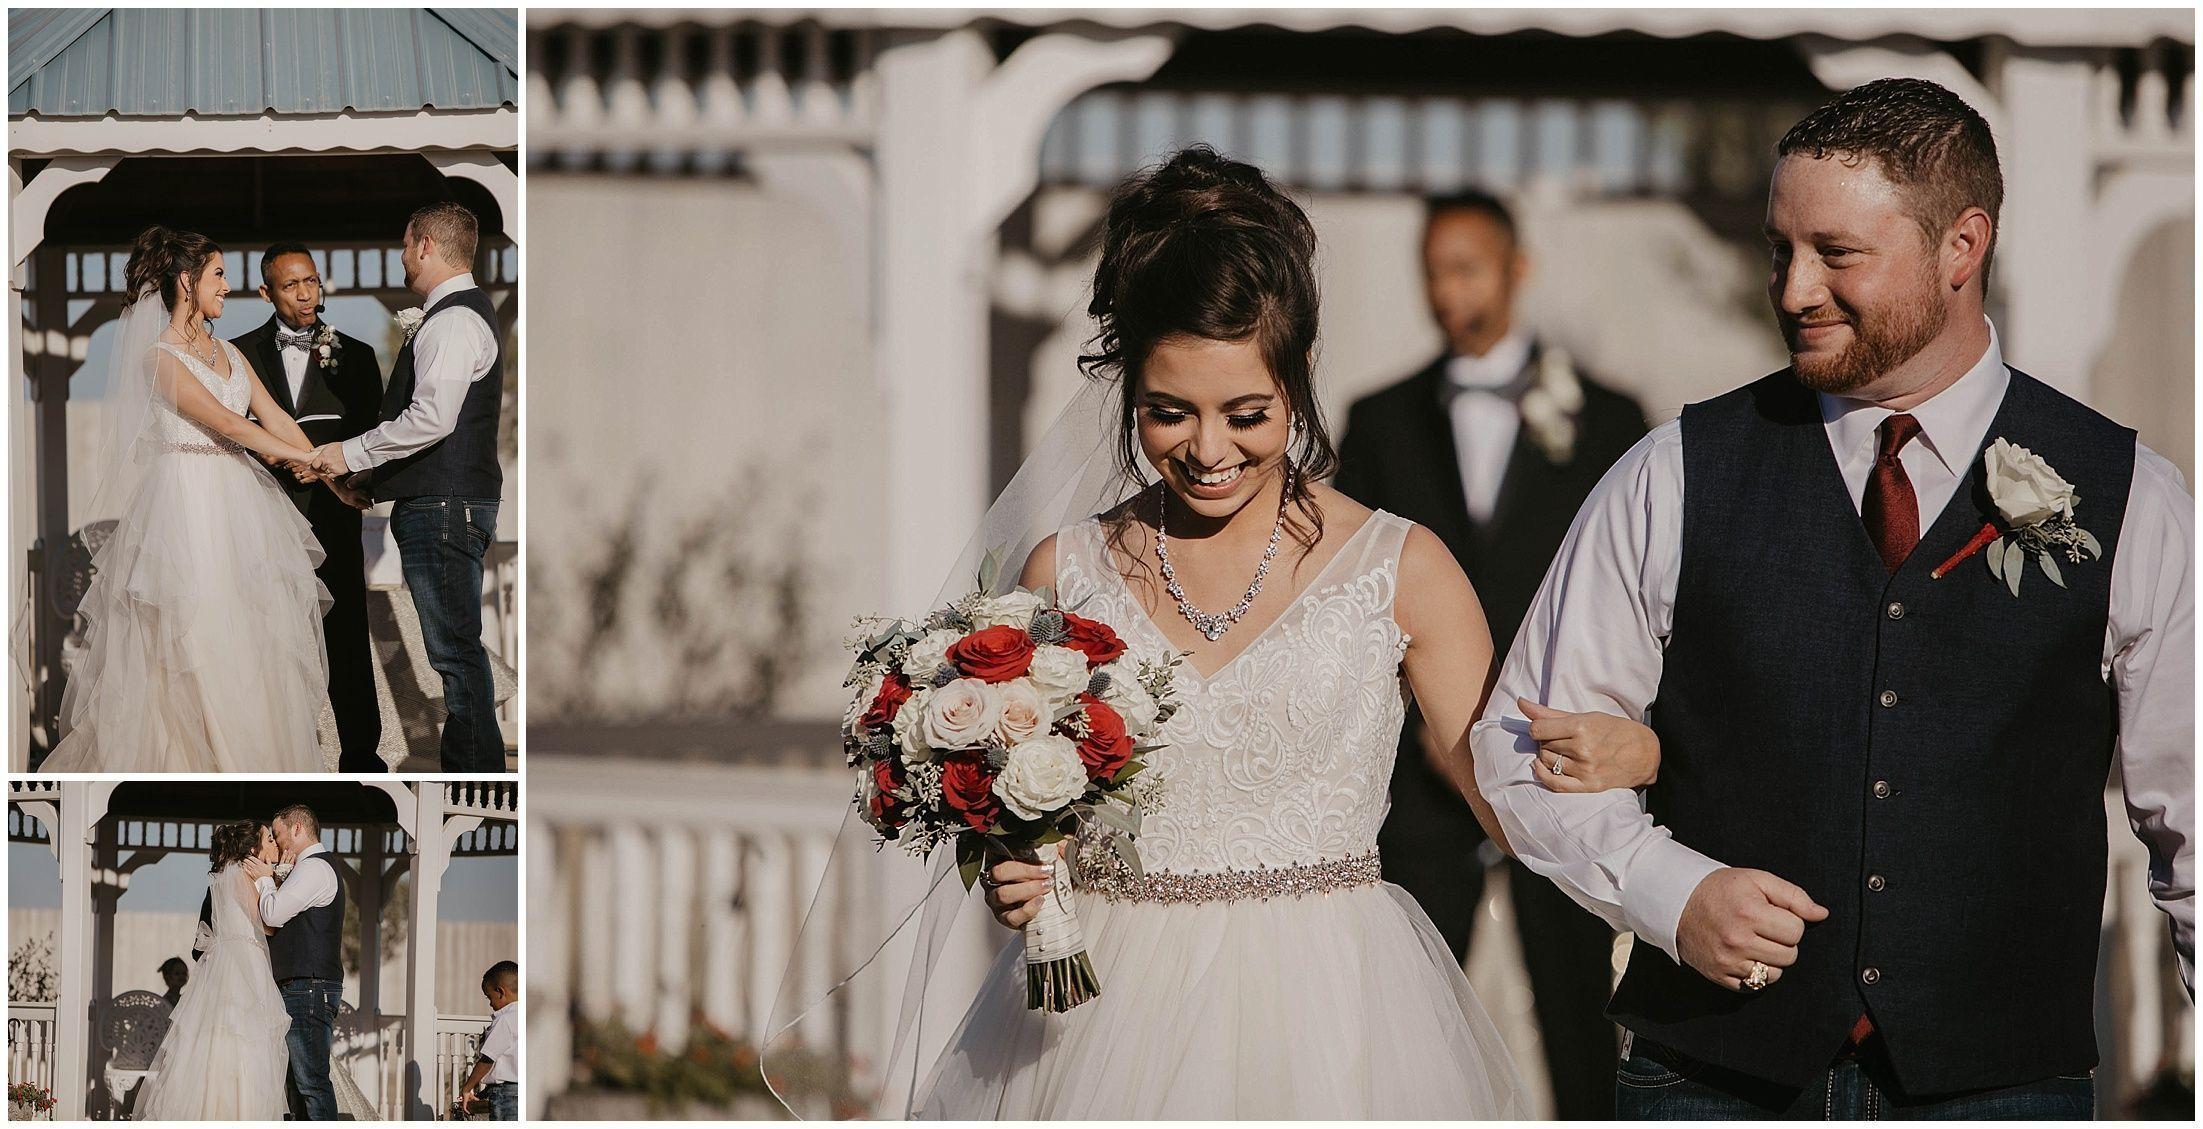 wedding ceremony, first kiss, wedding ideas, wedding